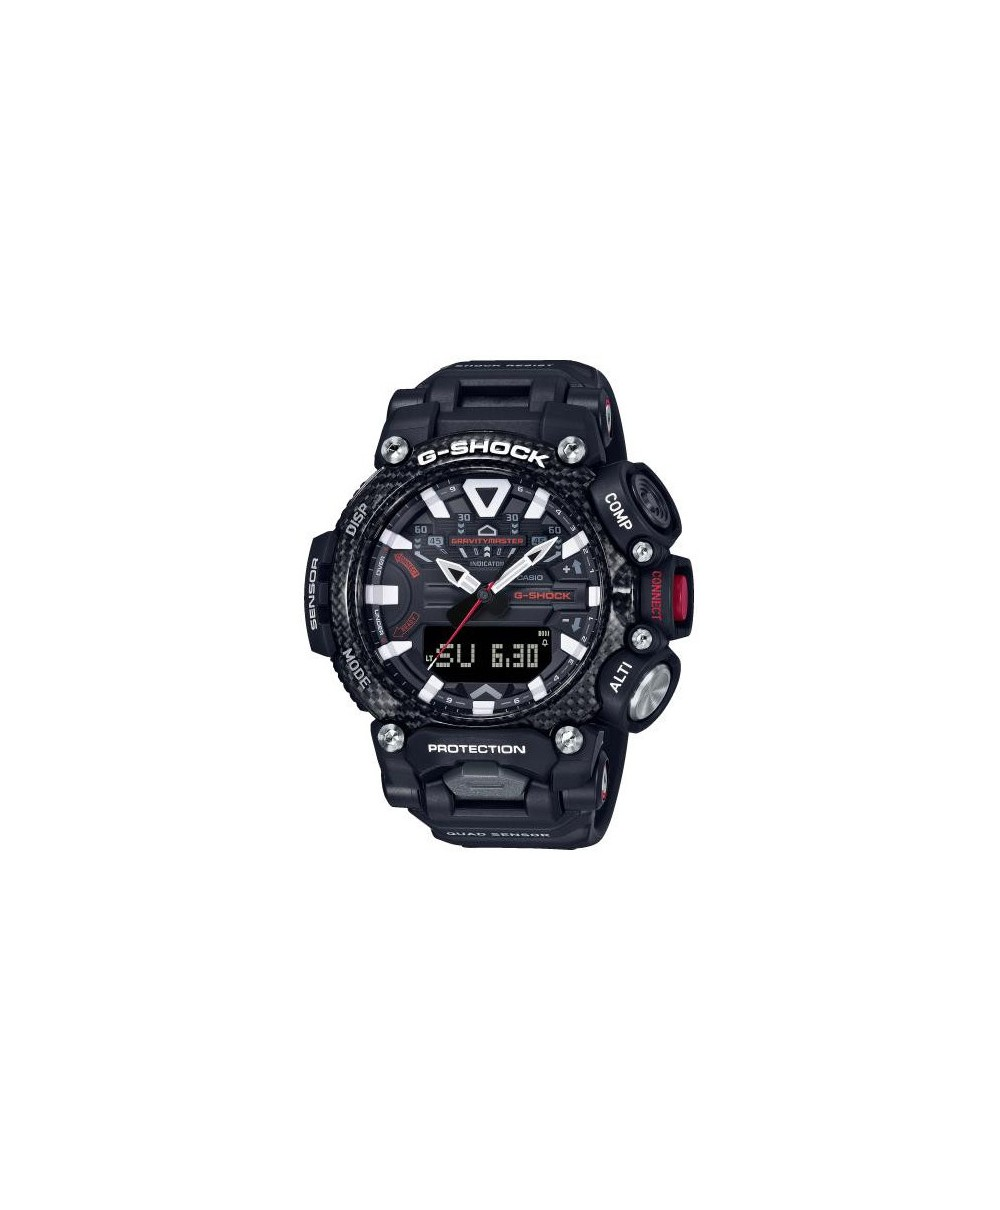 Reloj Casio G-Shock GravityMaster GR-B200-1AER